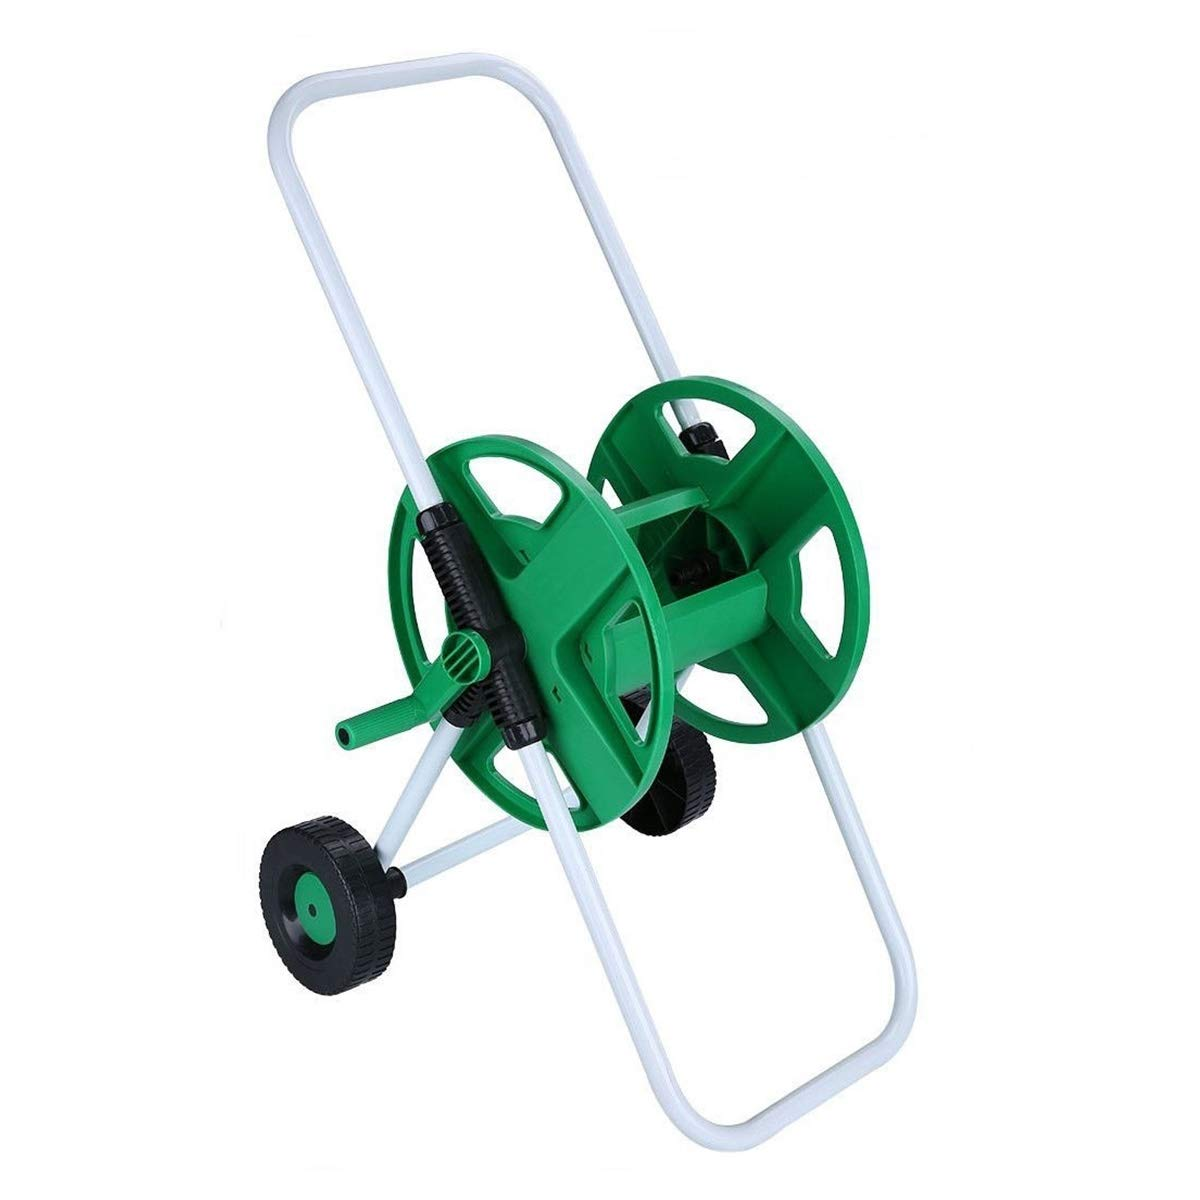 J&T Hose Reel Mobile Rolling Cart Storage Holder Outdoor Garden Water Pipe, 150 ft.